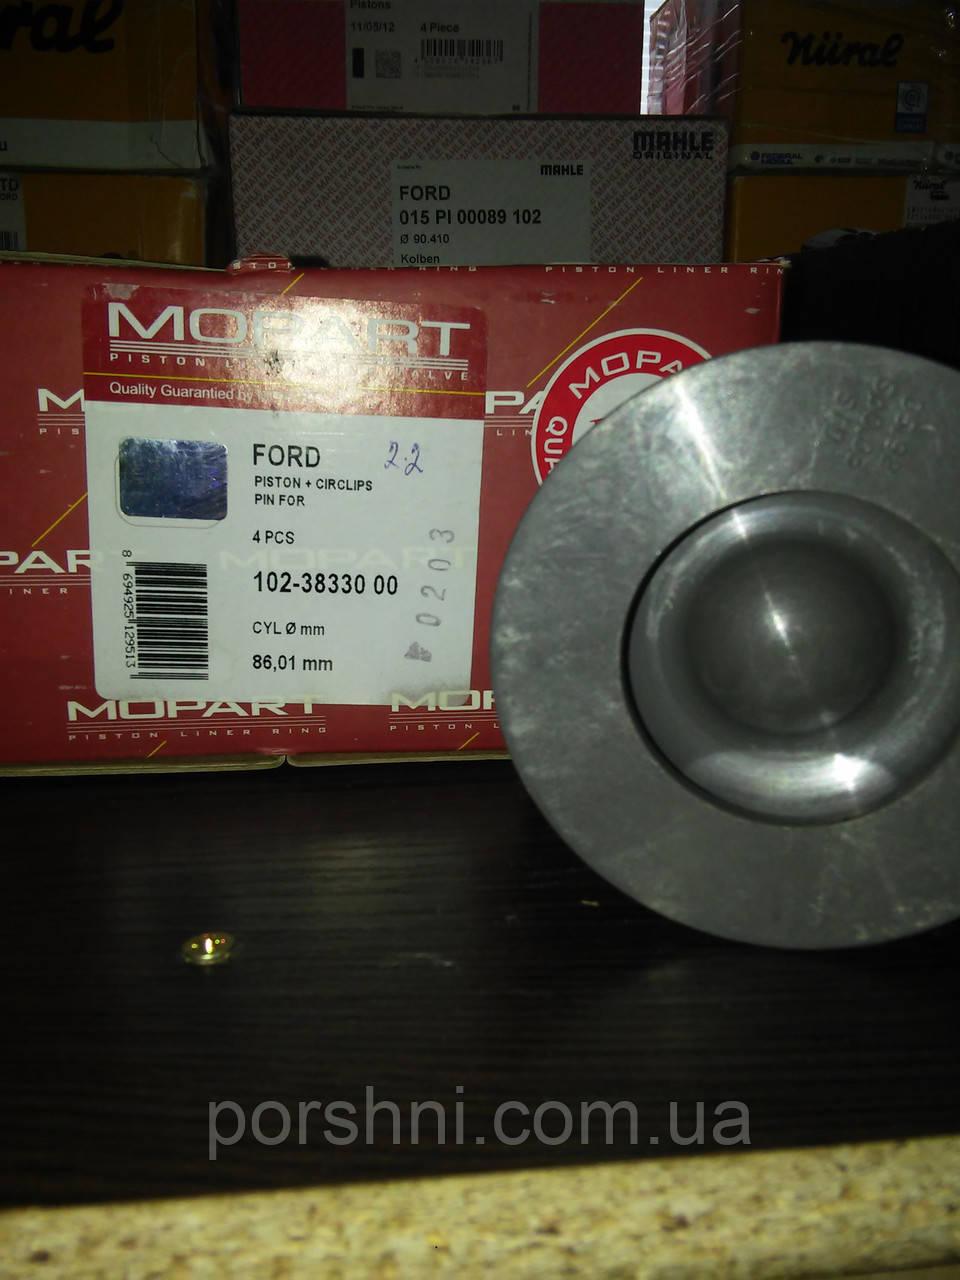 Поршневая  Тransit  V347 2.2 DURA  2006 - 130PS ( 2 x 2 x 2 ) 86STD  Mopart 3833000